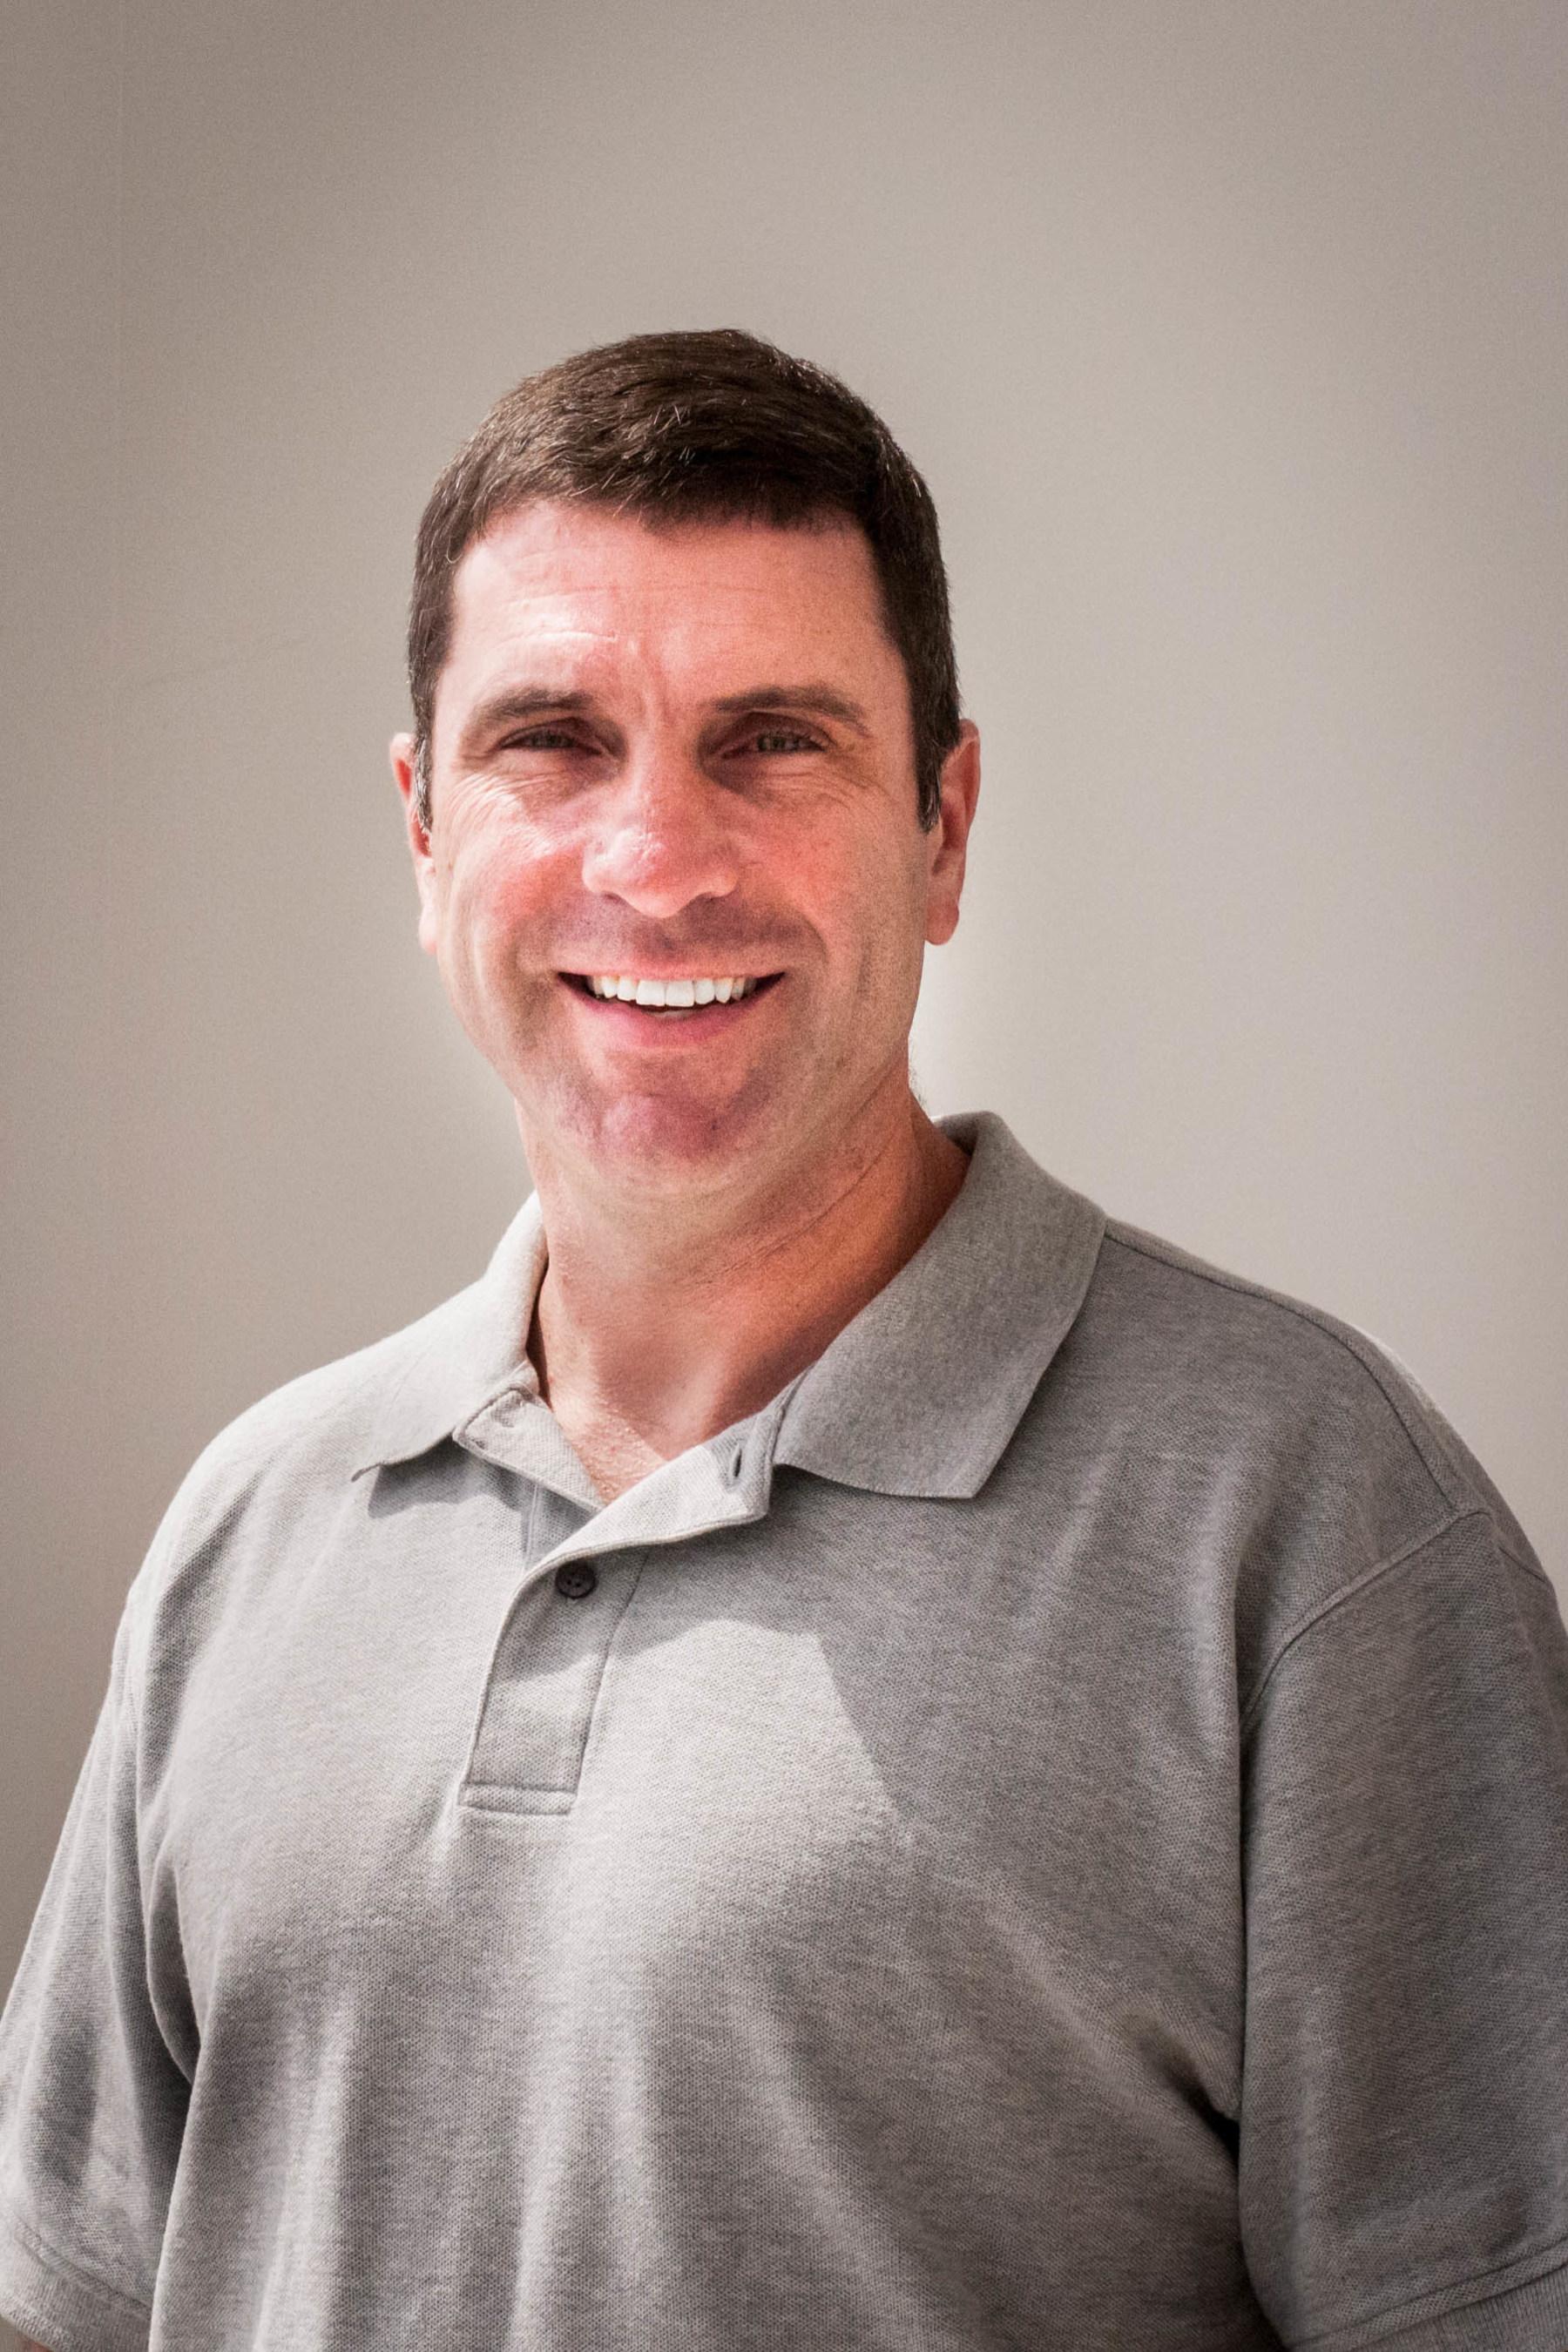 RapidAdvance's new CEO Will Tumulty